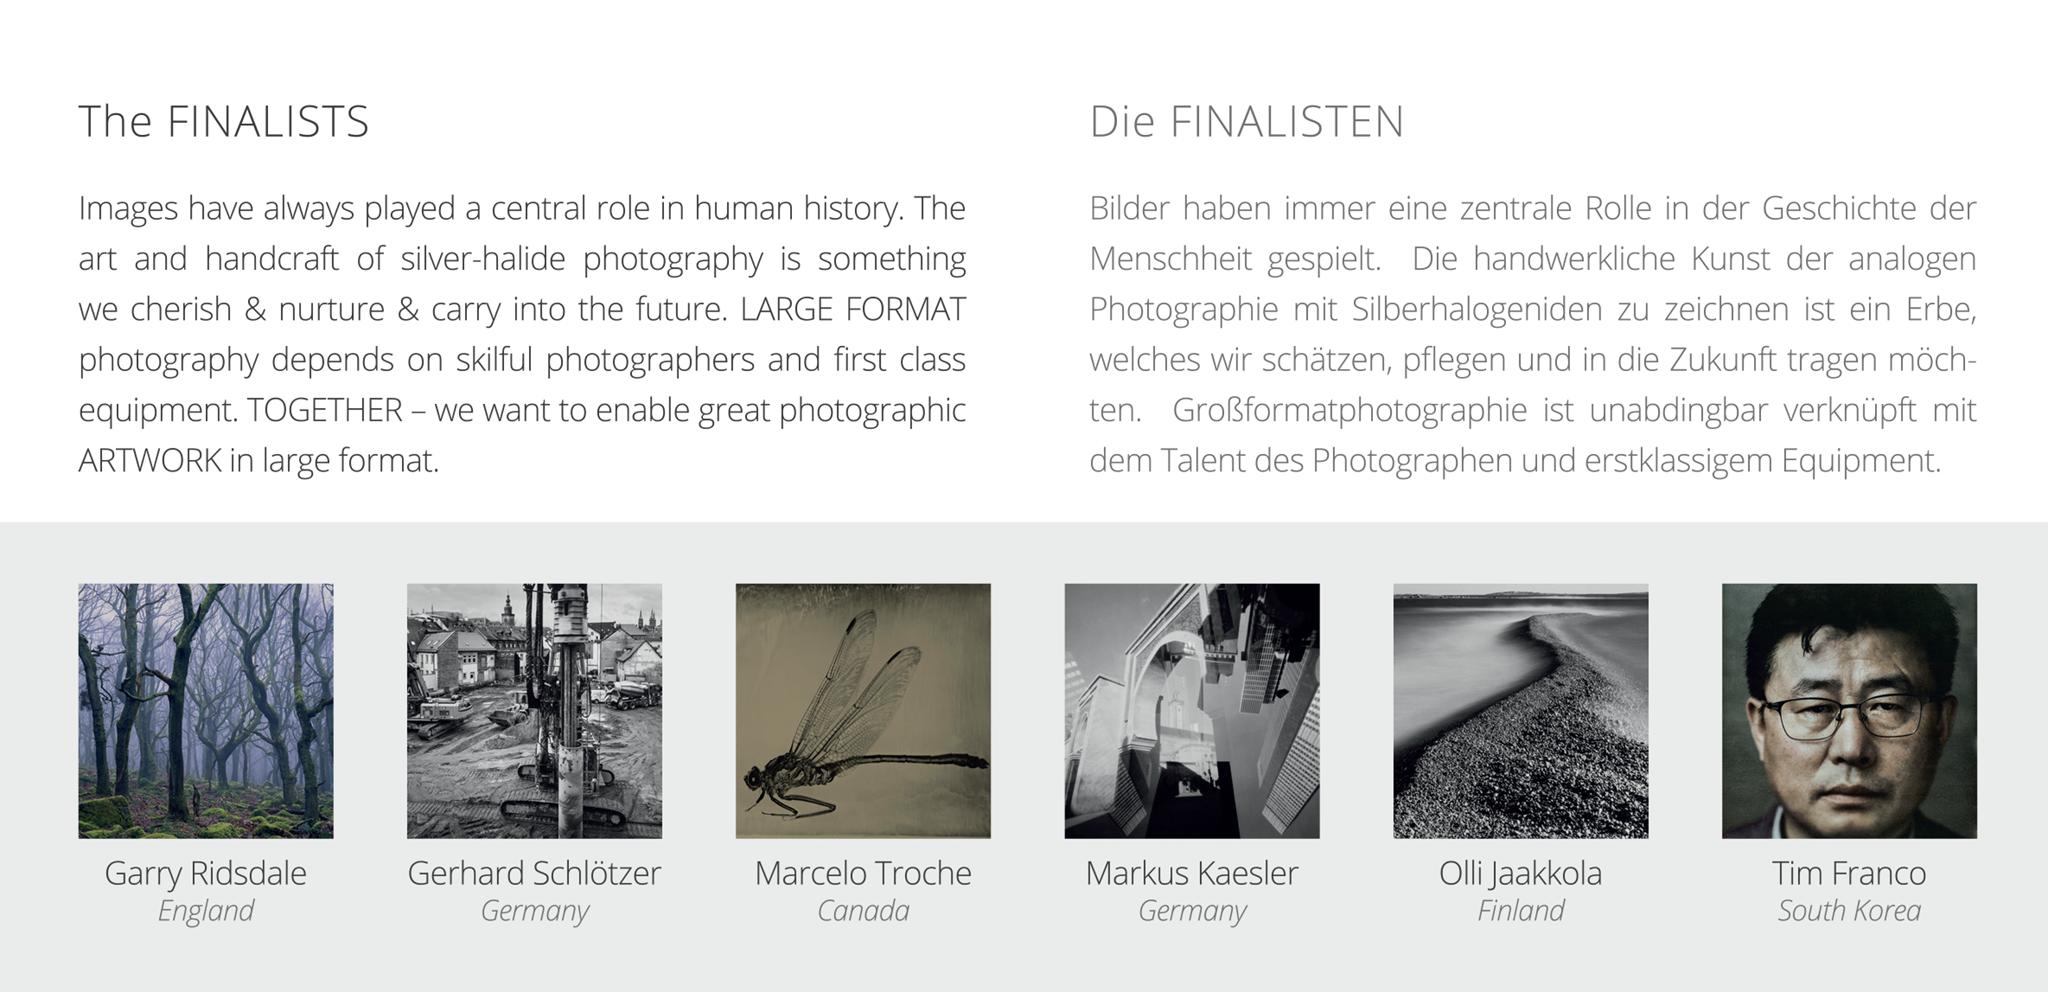 Photo Contest Award Ceremony 2018_Flyer_2018-08-17_flyeralarm_Schnittmarken-finalists.png